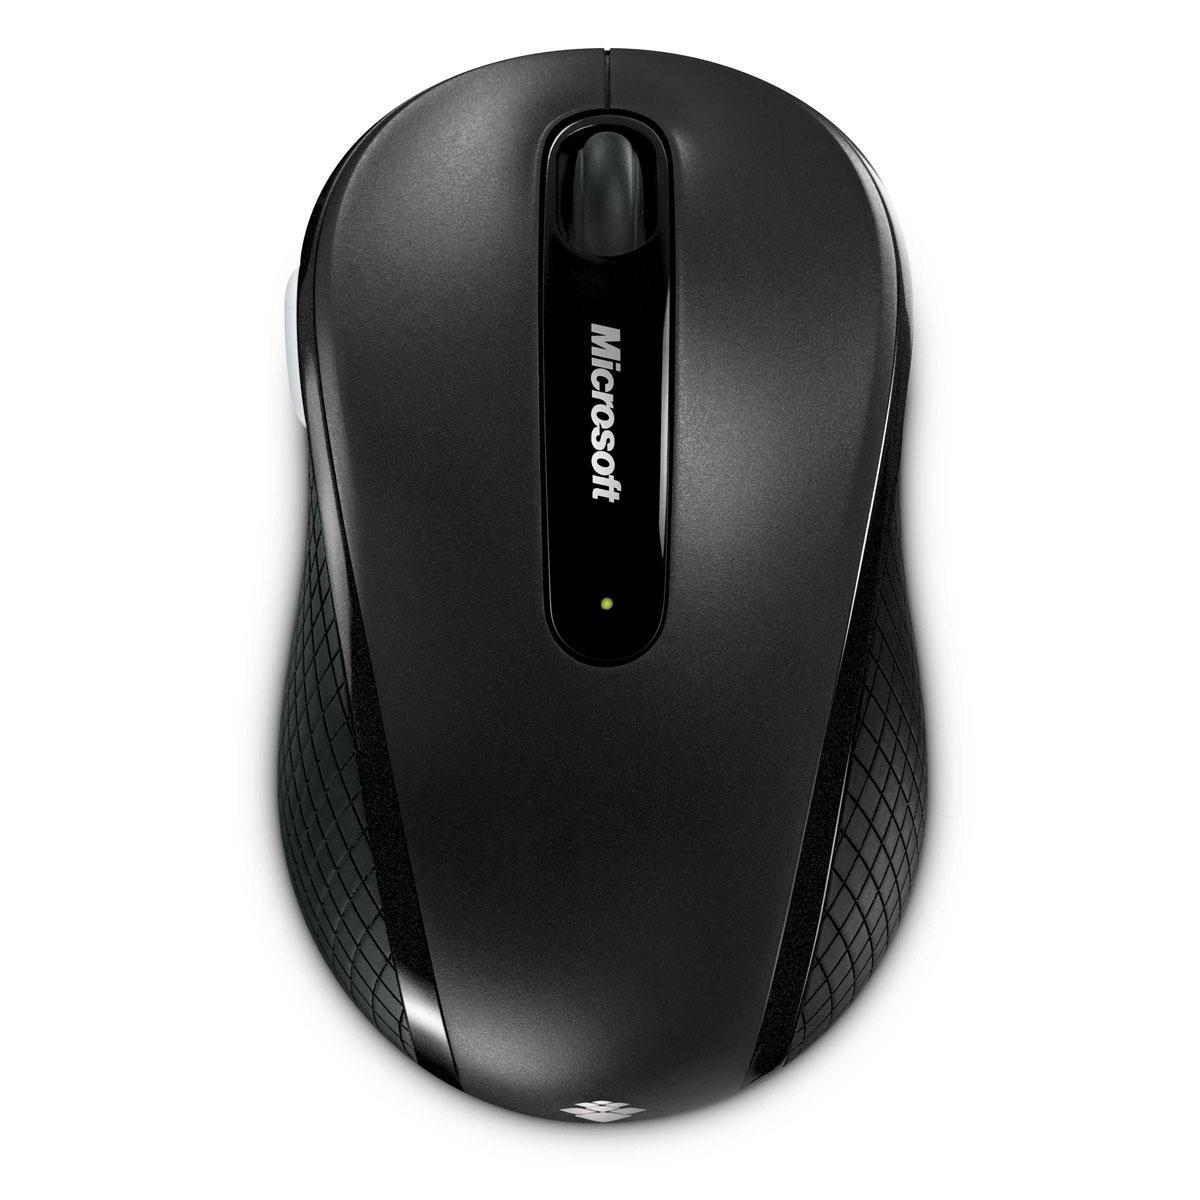 Souris Microsoft Wireless Mobile Mouse 4000 - Noir